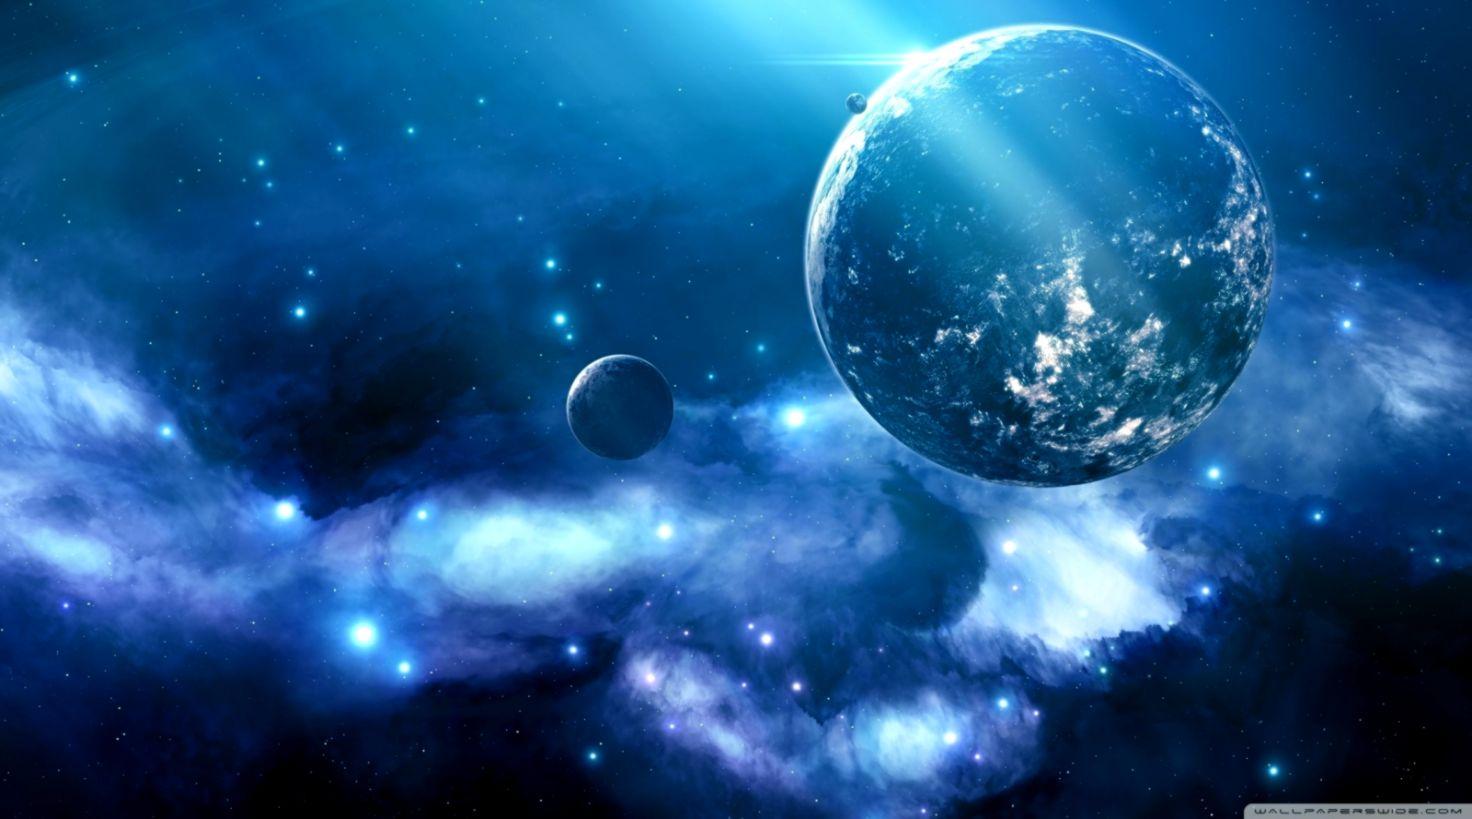 Space Blue Galaxy Hd Wallpaper Desktop Wallpapers Beautiful